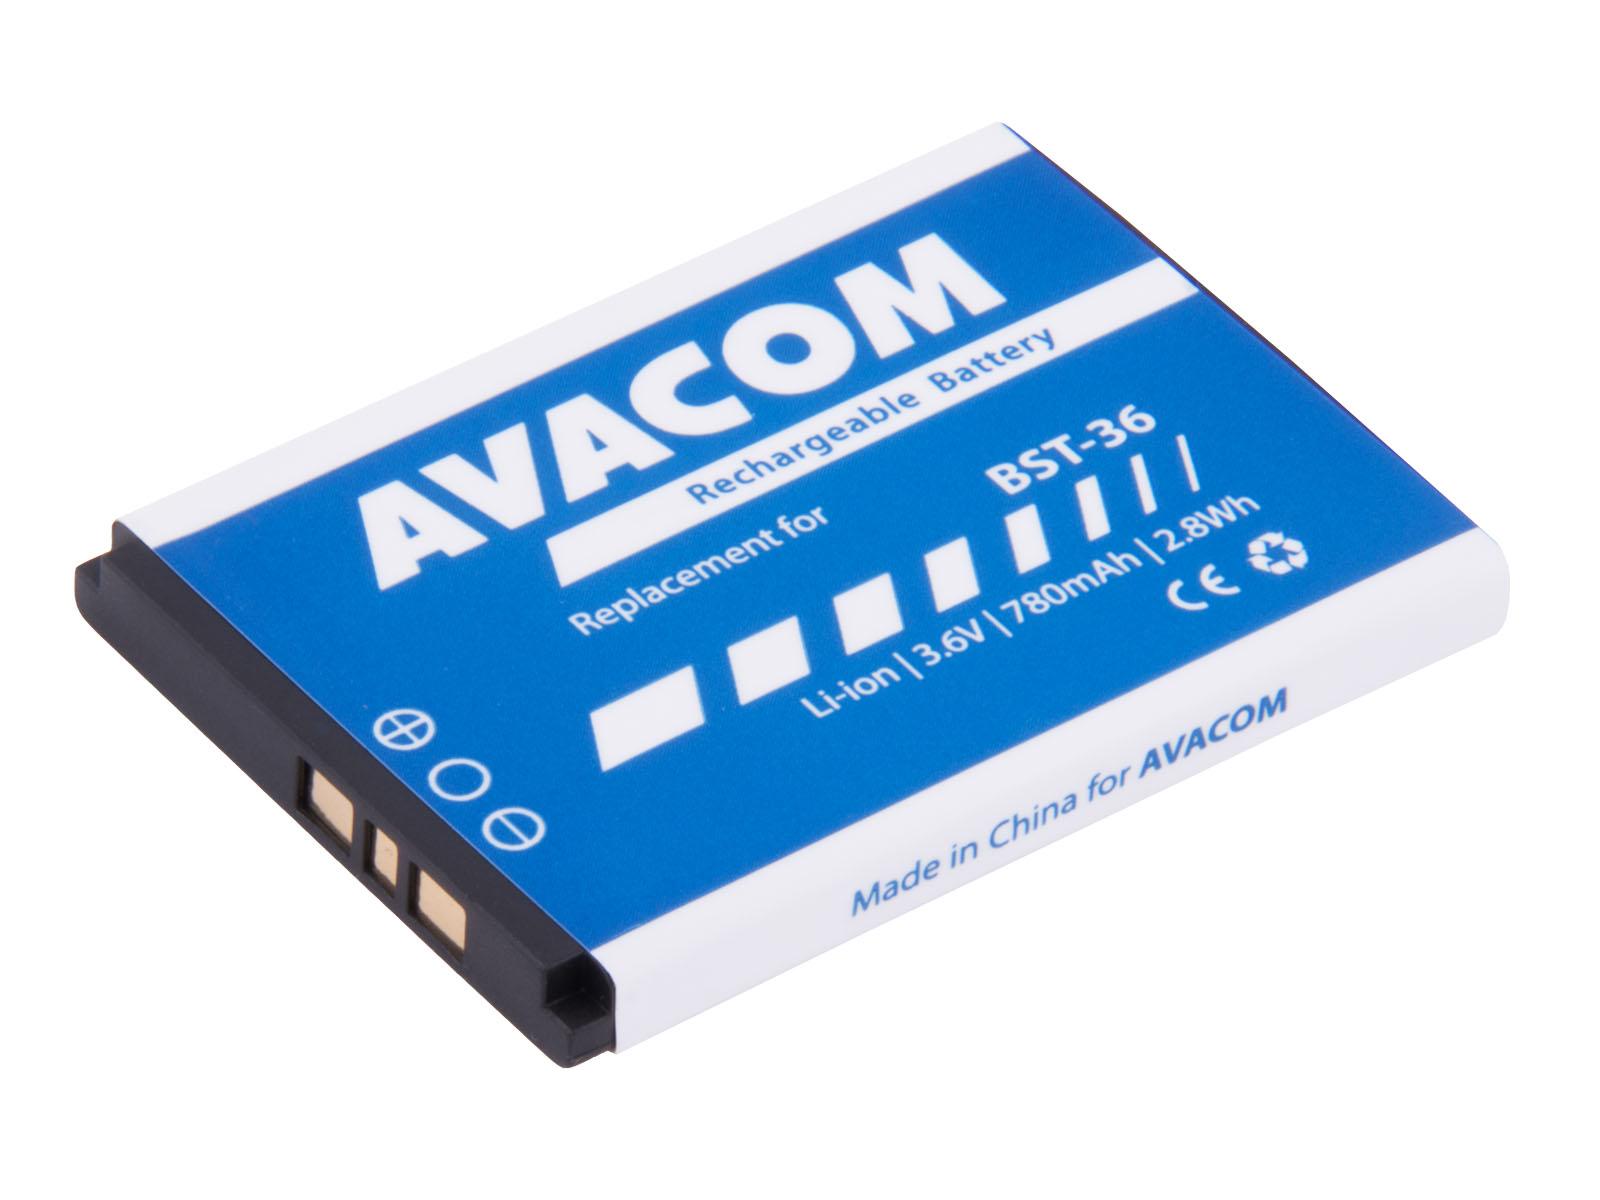 Baterie AVACOM GSSE-J300-S780 do mobilu Sony Ericsson J300, W200 Li-Ion 3,7V 780mAh